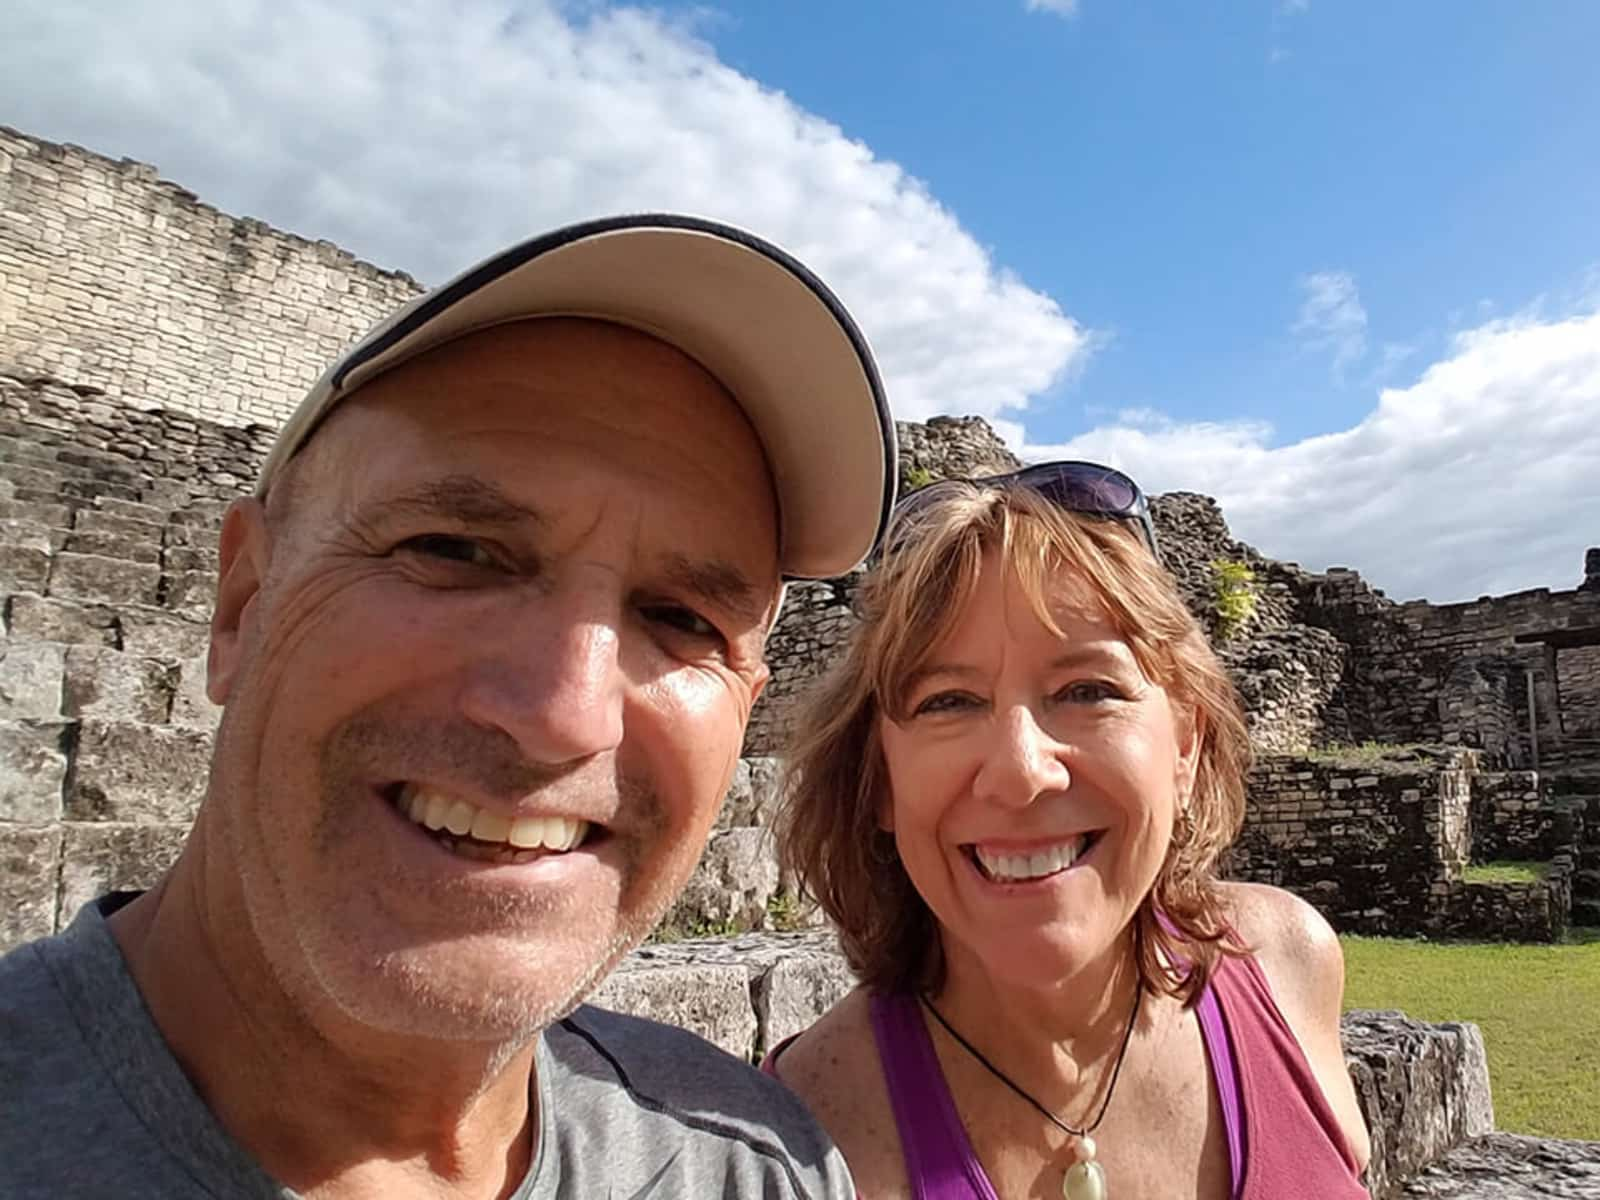 John & anel & Anel from San Ignacio, Belize